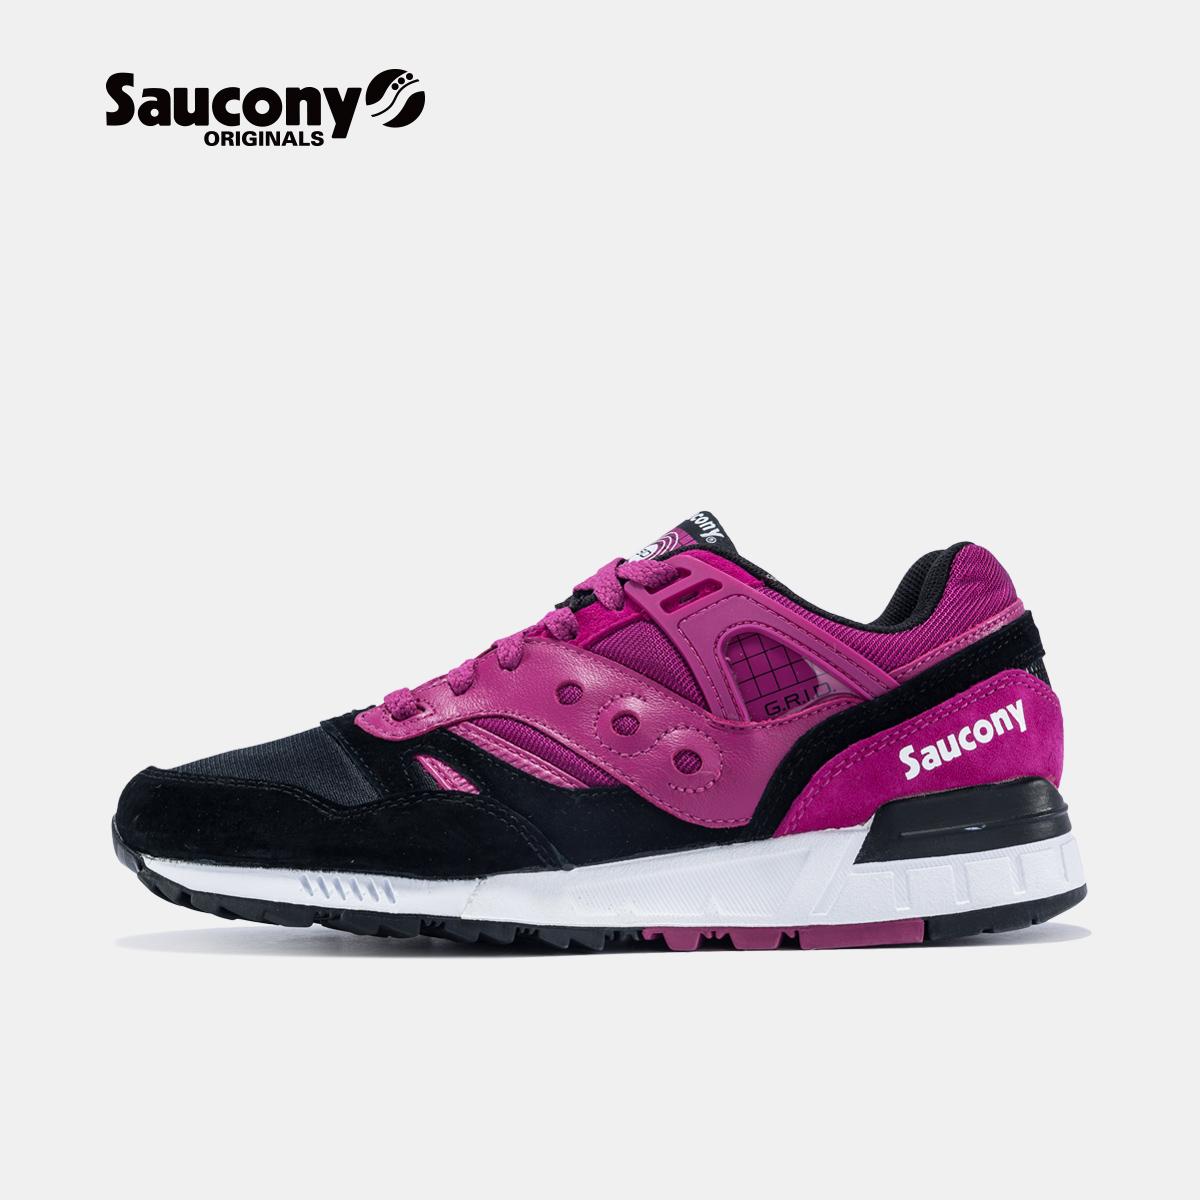 Saucony圣康尼 GRID SD 复古跑鞋运动鞋 男子跑步鞋 S70224